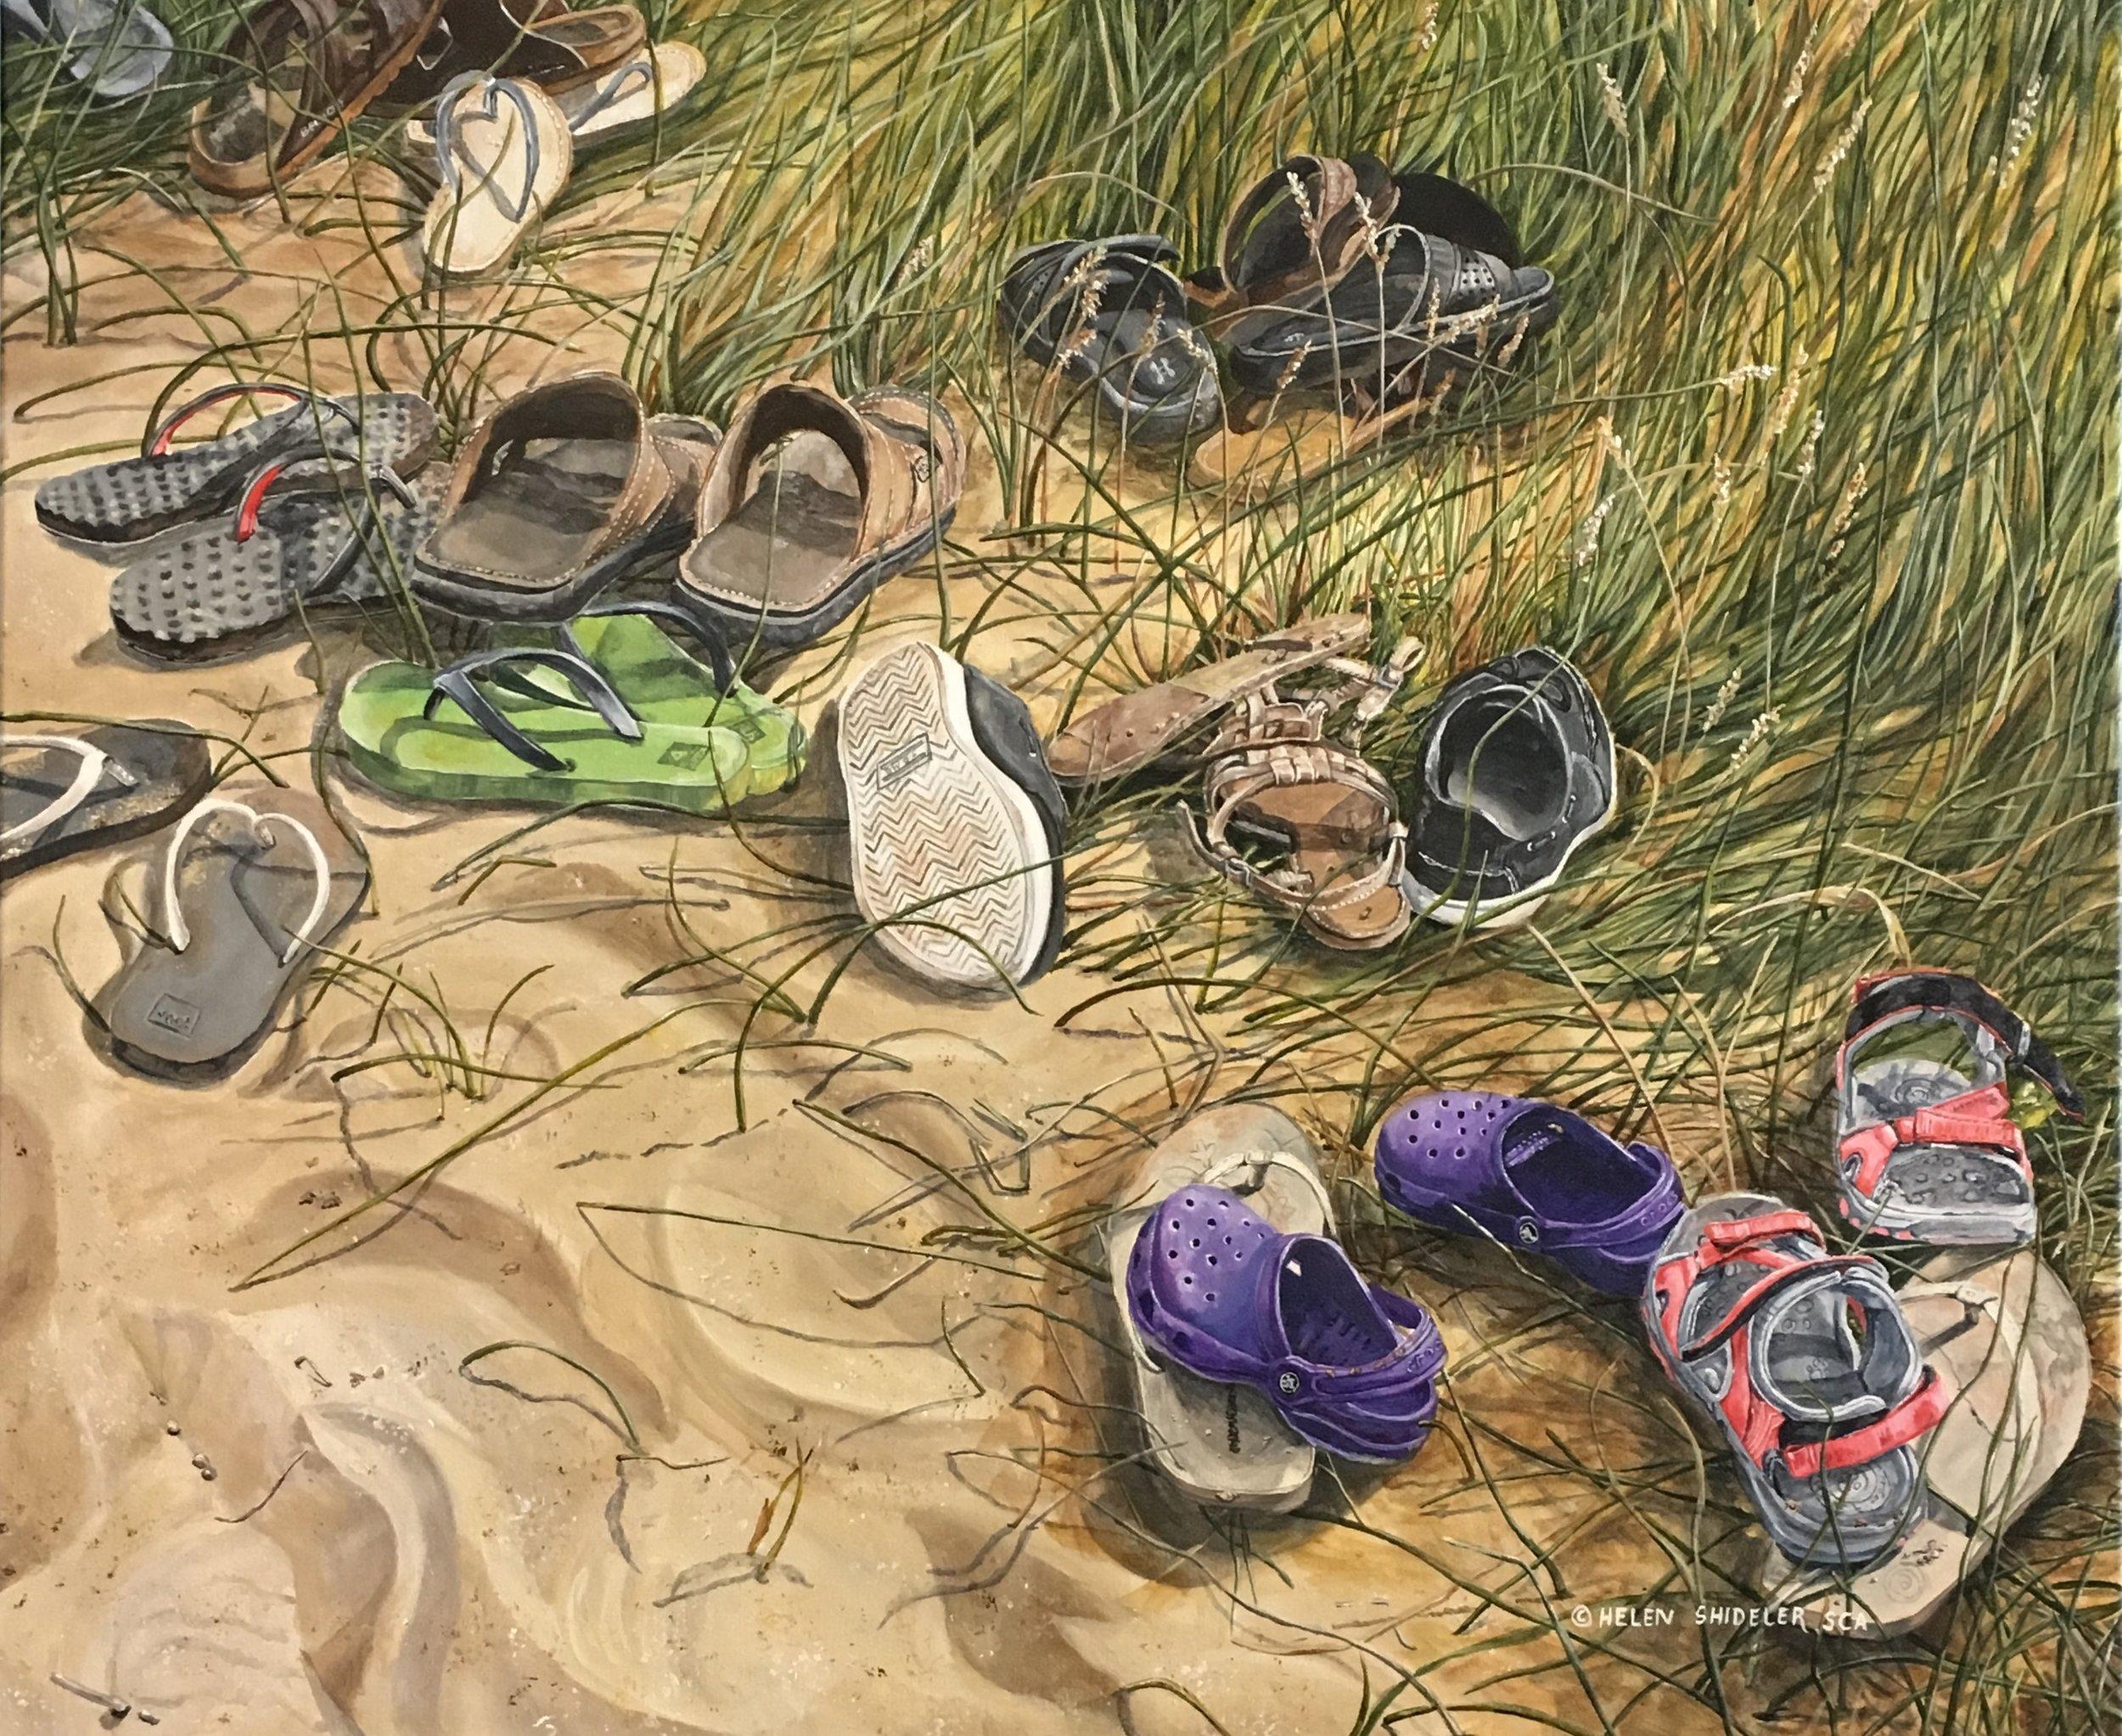 Footloose by Helen Shideler